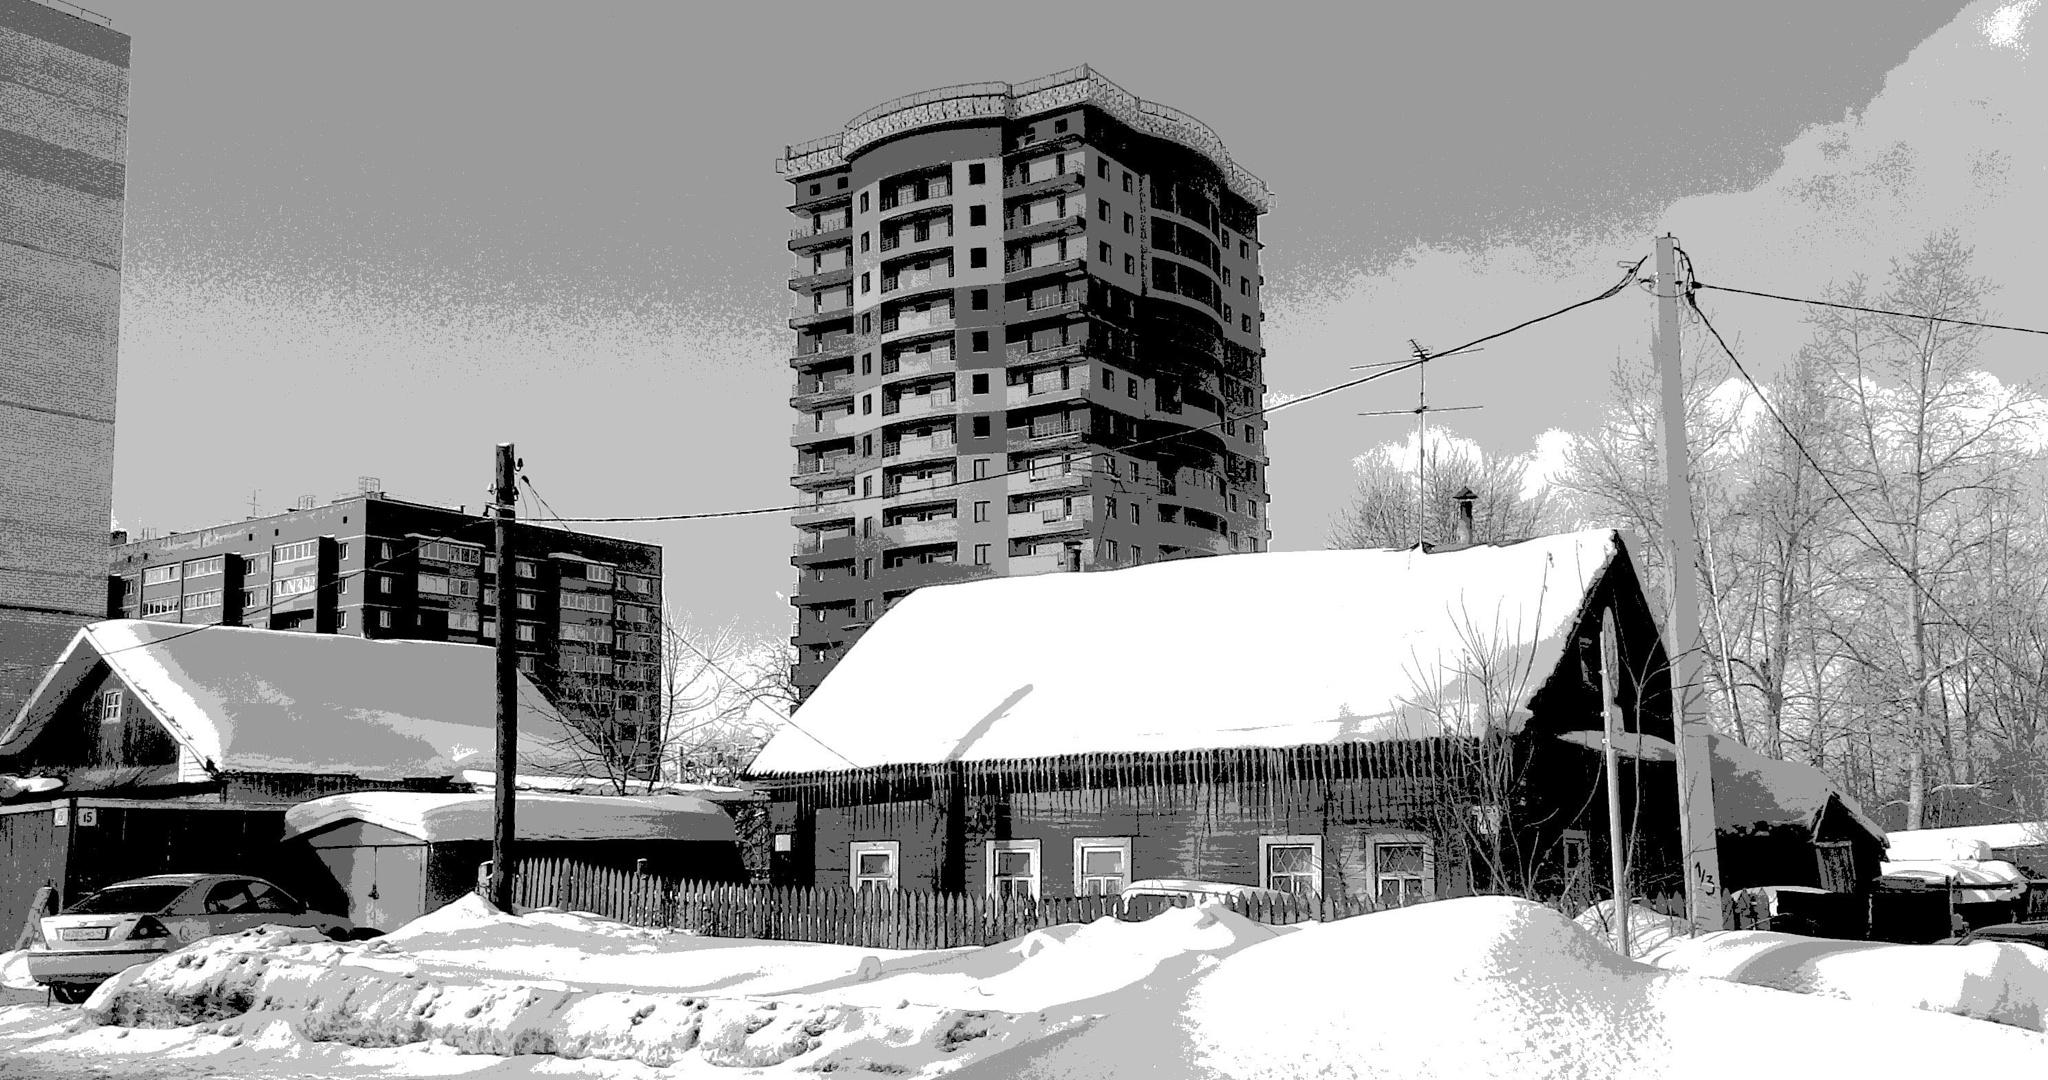 Untitled by Yurij Polushin